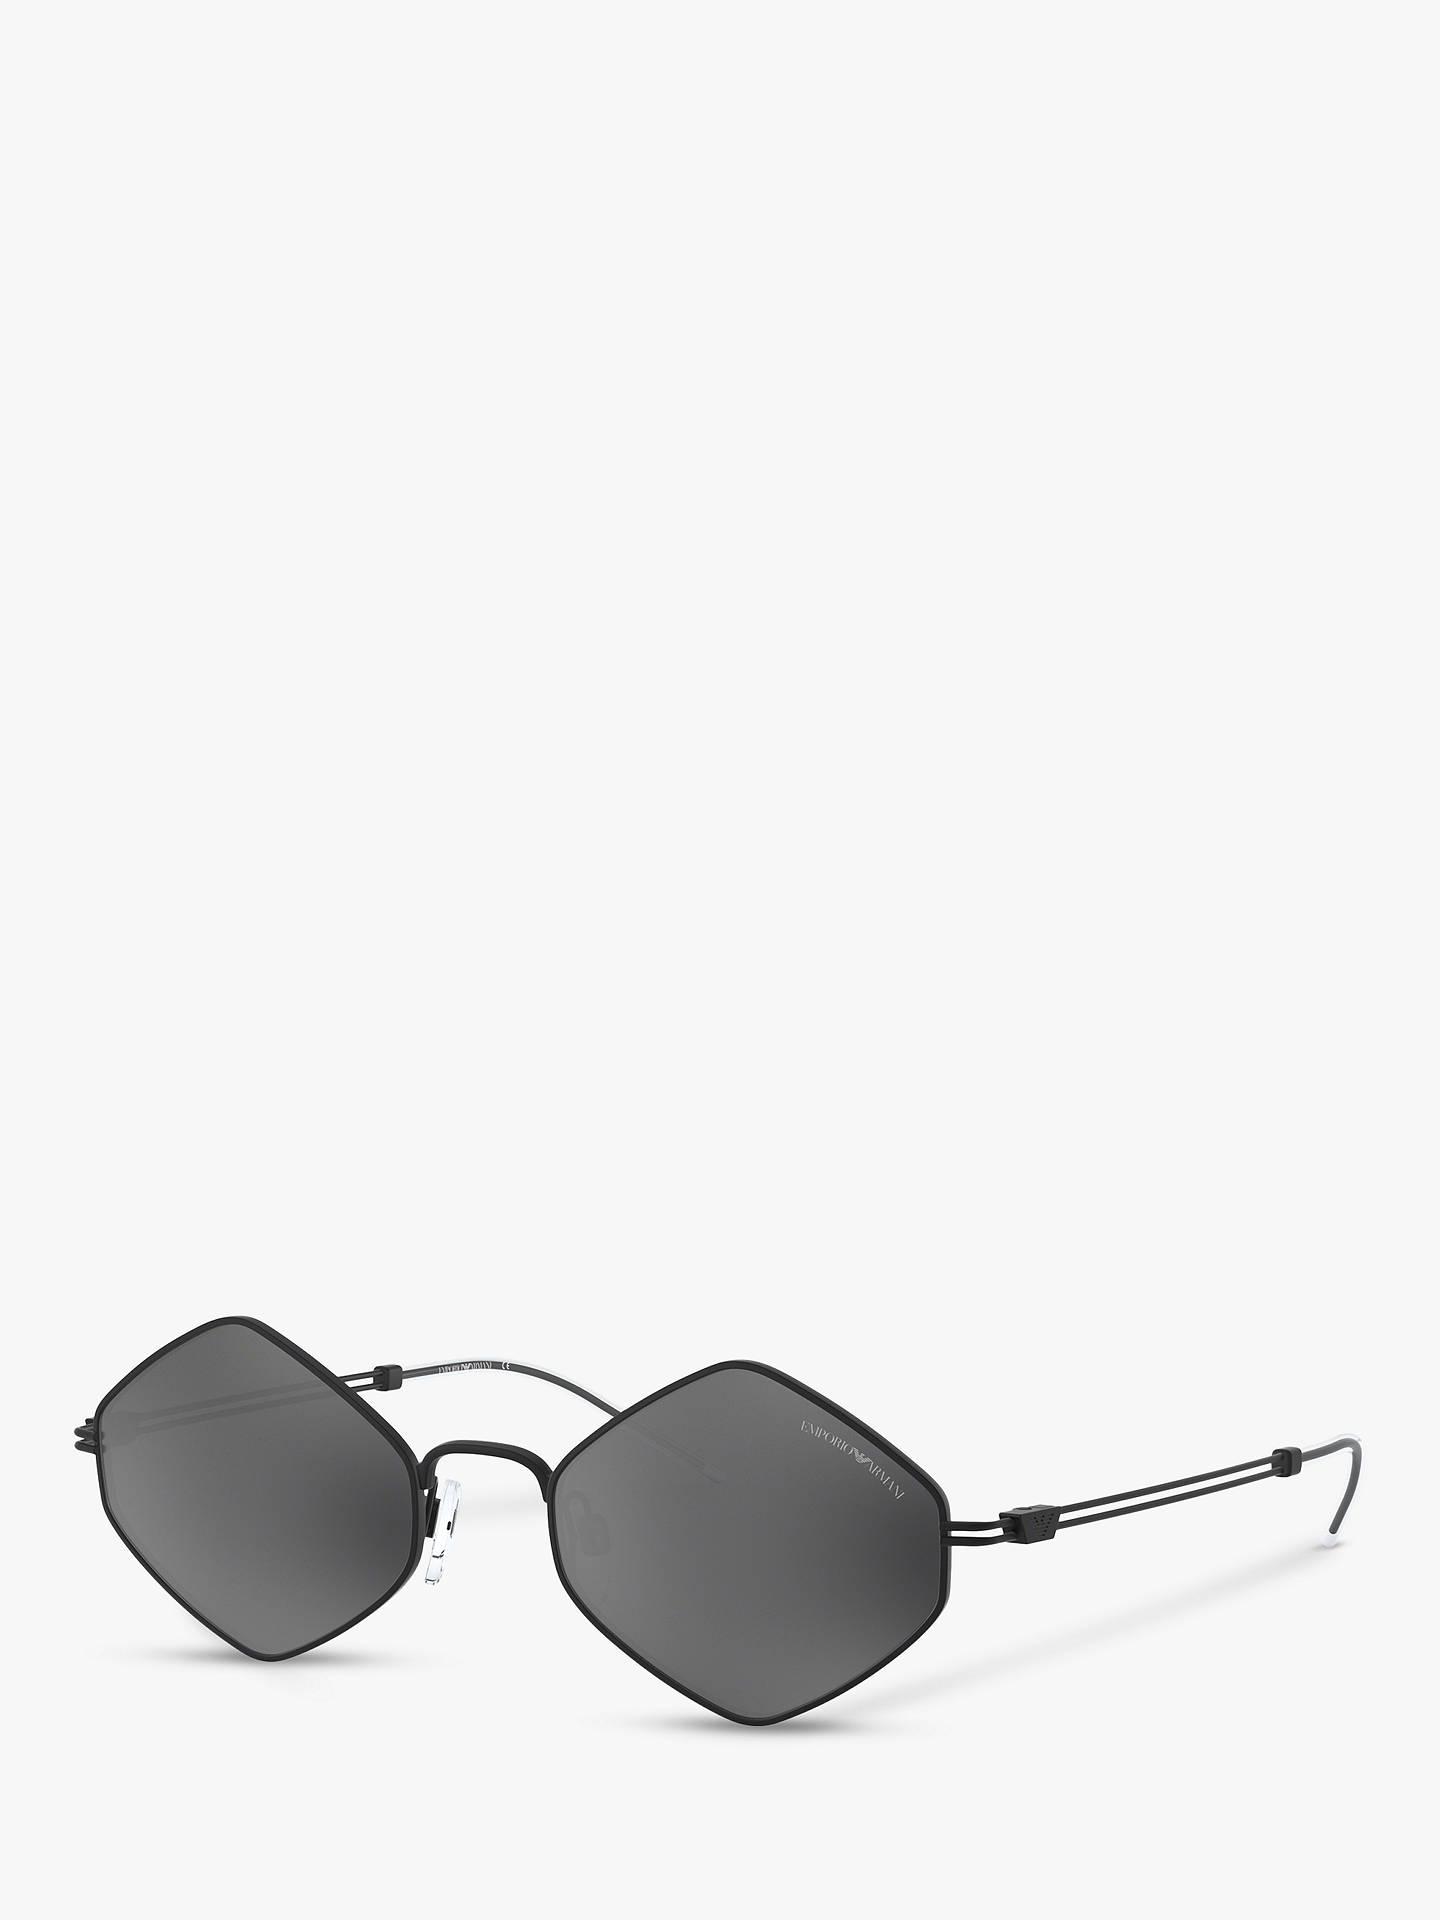 Men's Irregular Emporio Ea2085 Armani Oval SunglassesBlackgrey rCxBdoe